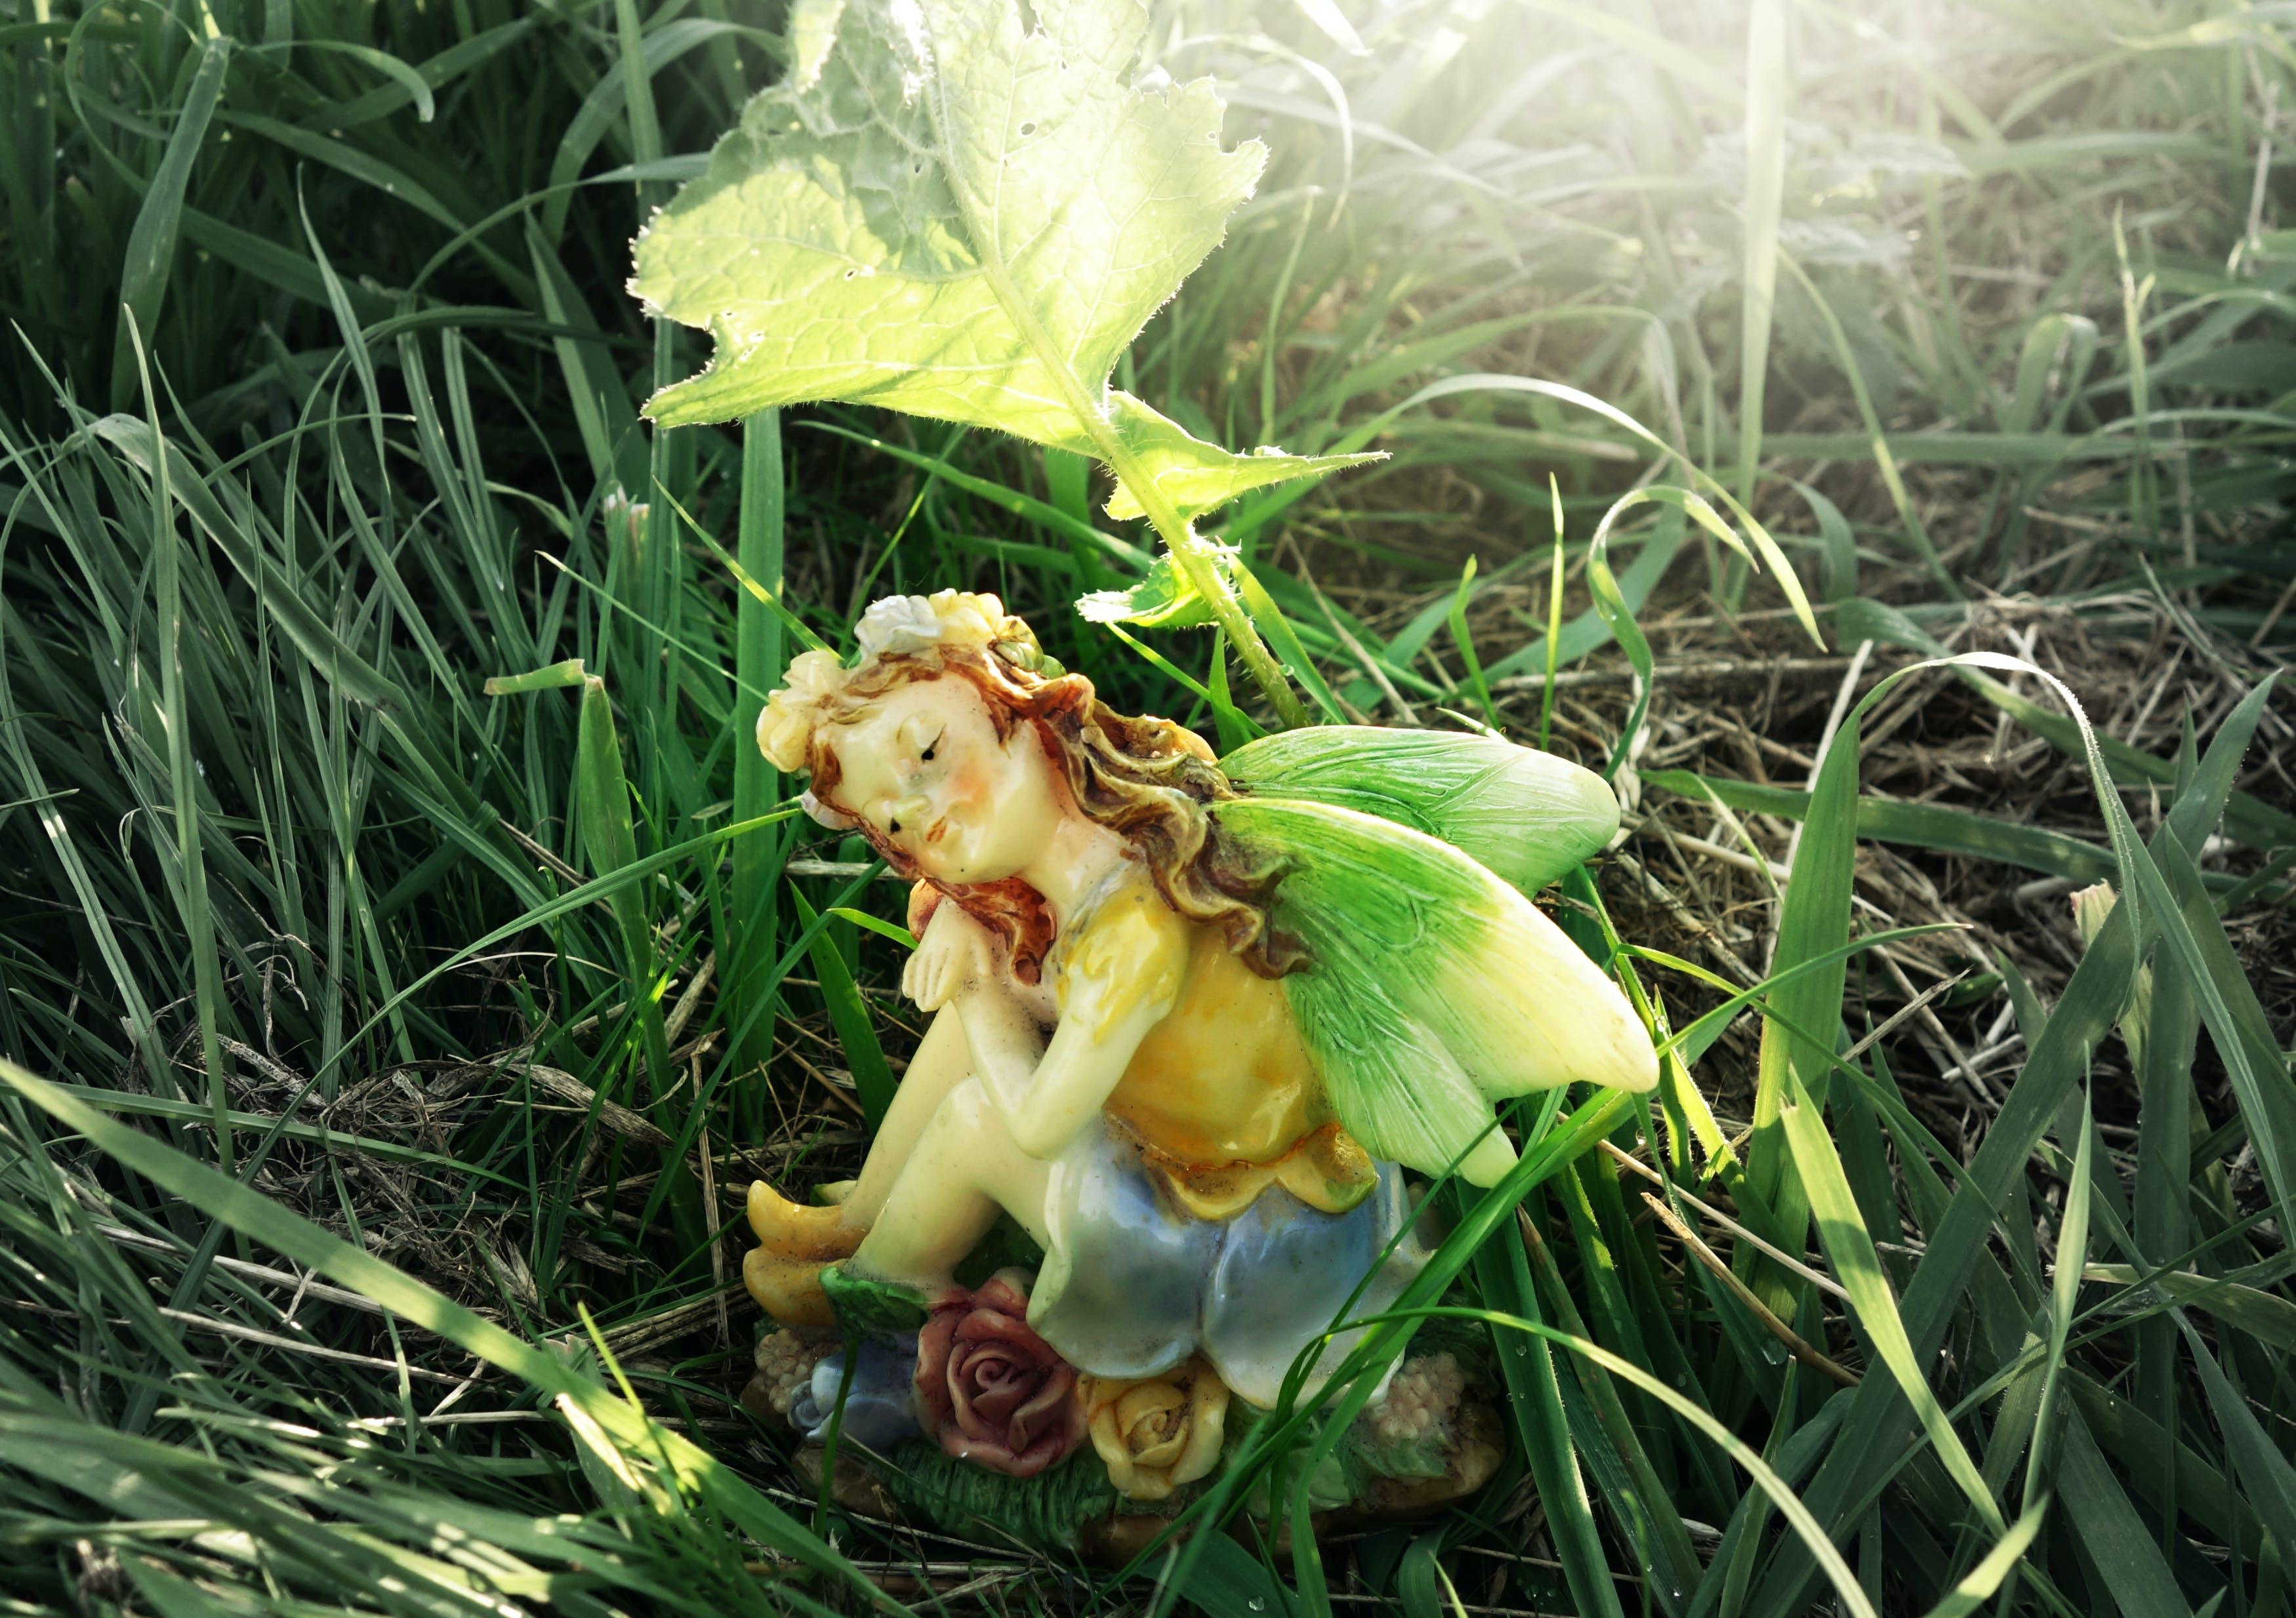 Free stock photo of fairy, magic, fantasy, statuette